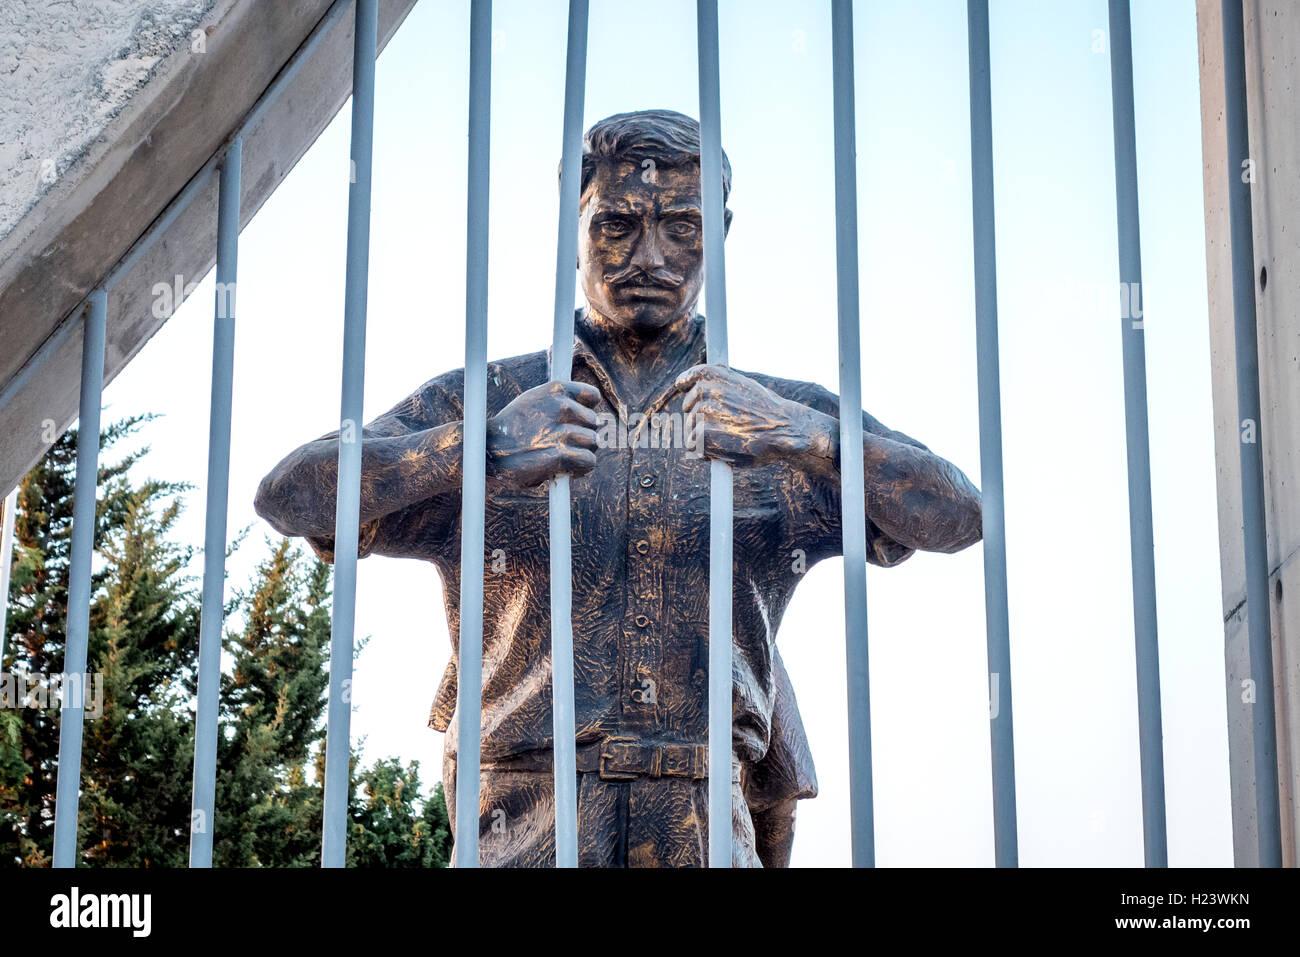 Peace memorial sculpture in the city of Kyrenia - Stock Image